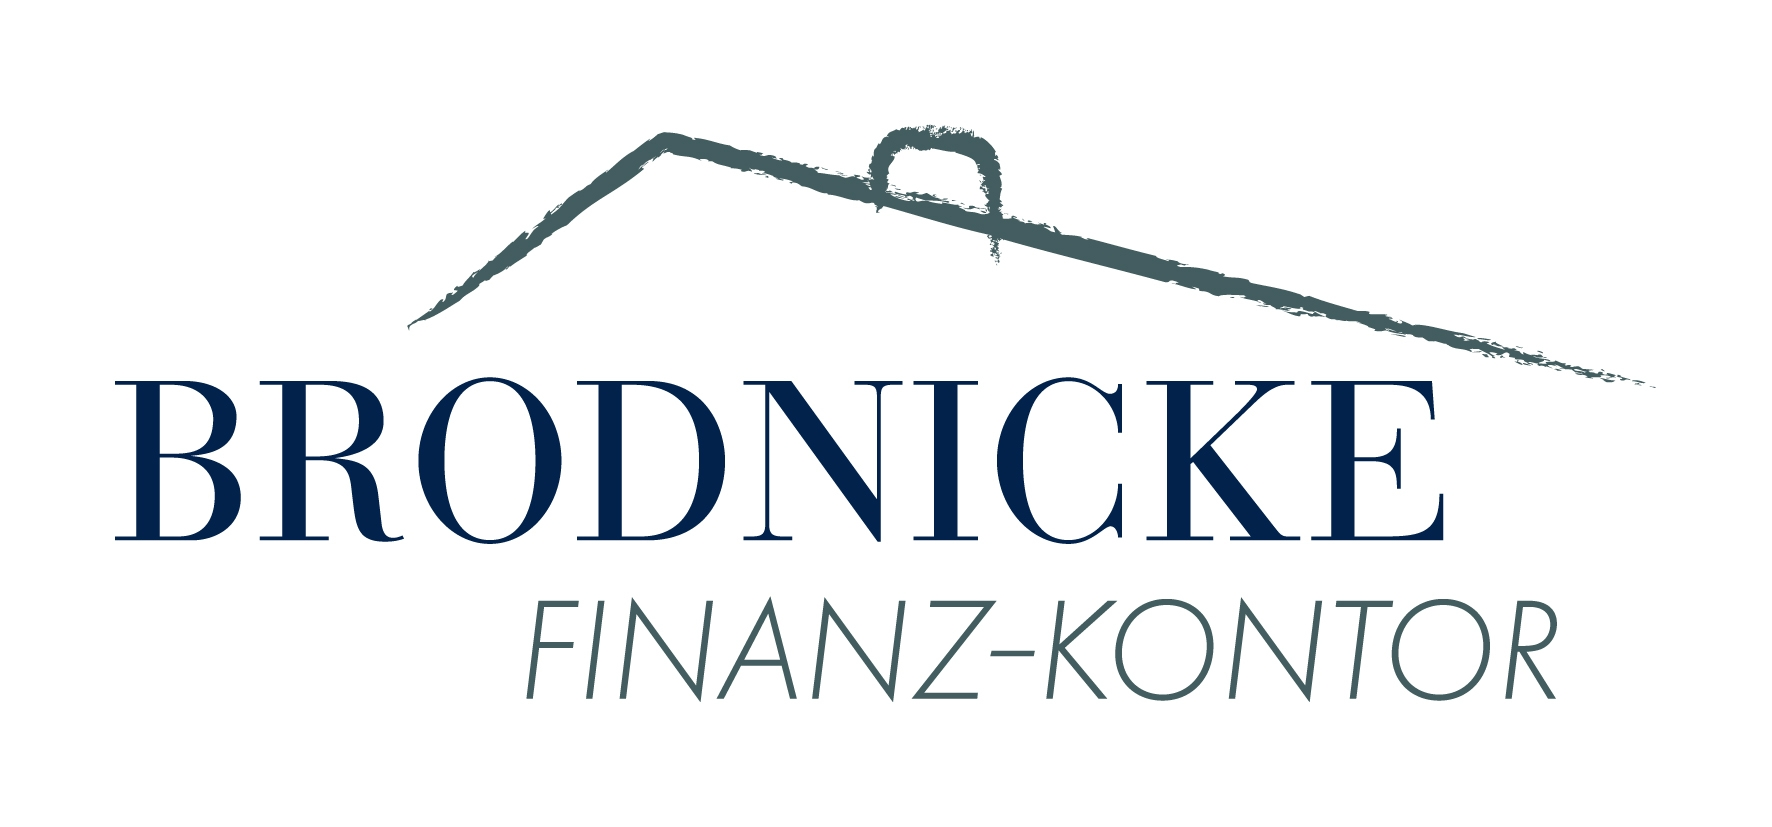 Brodnicke Finanz-Kontor